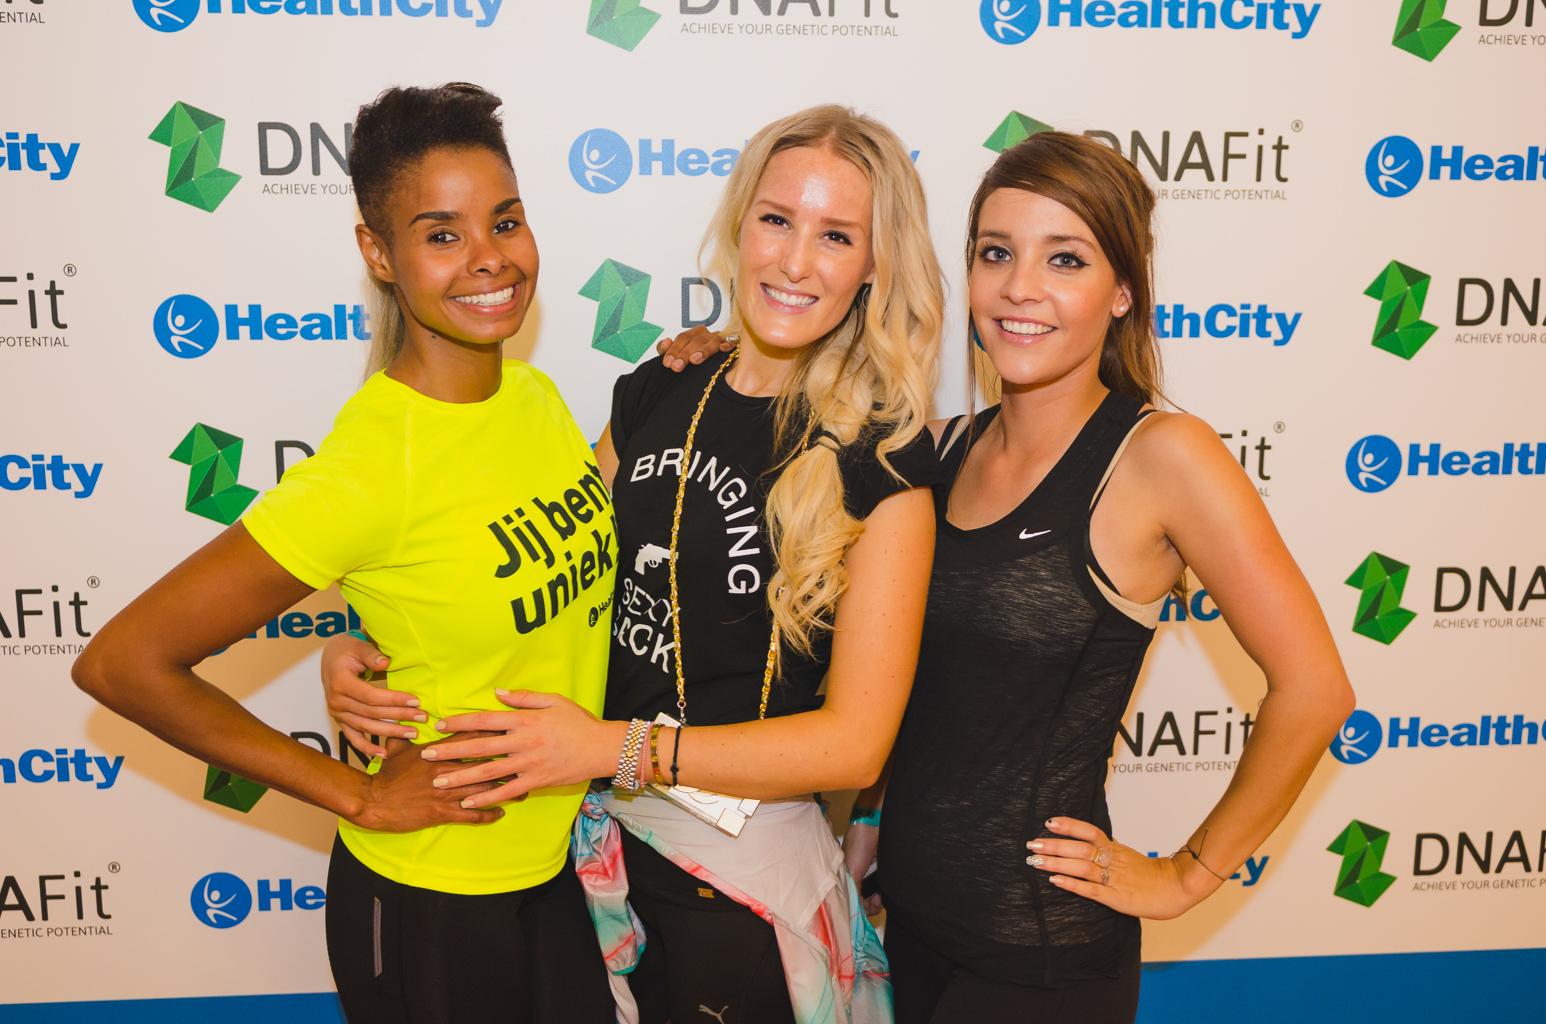 20140917 Healthcity DNAFit-043